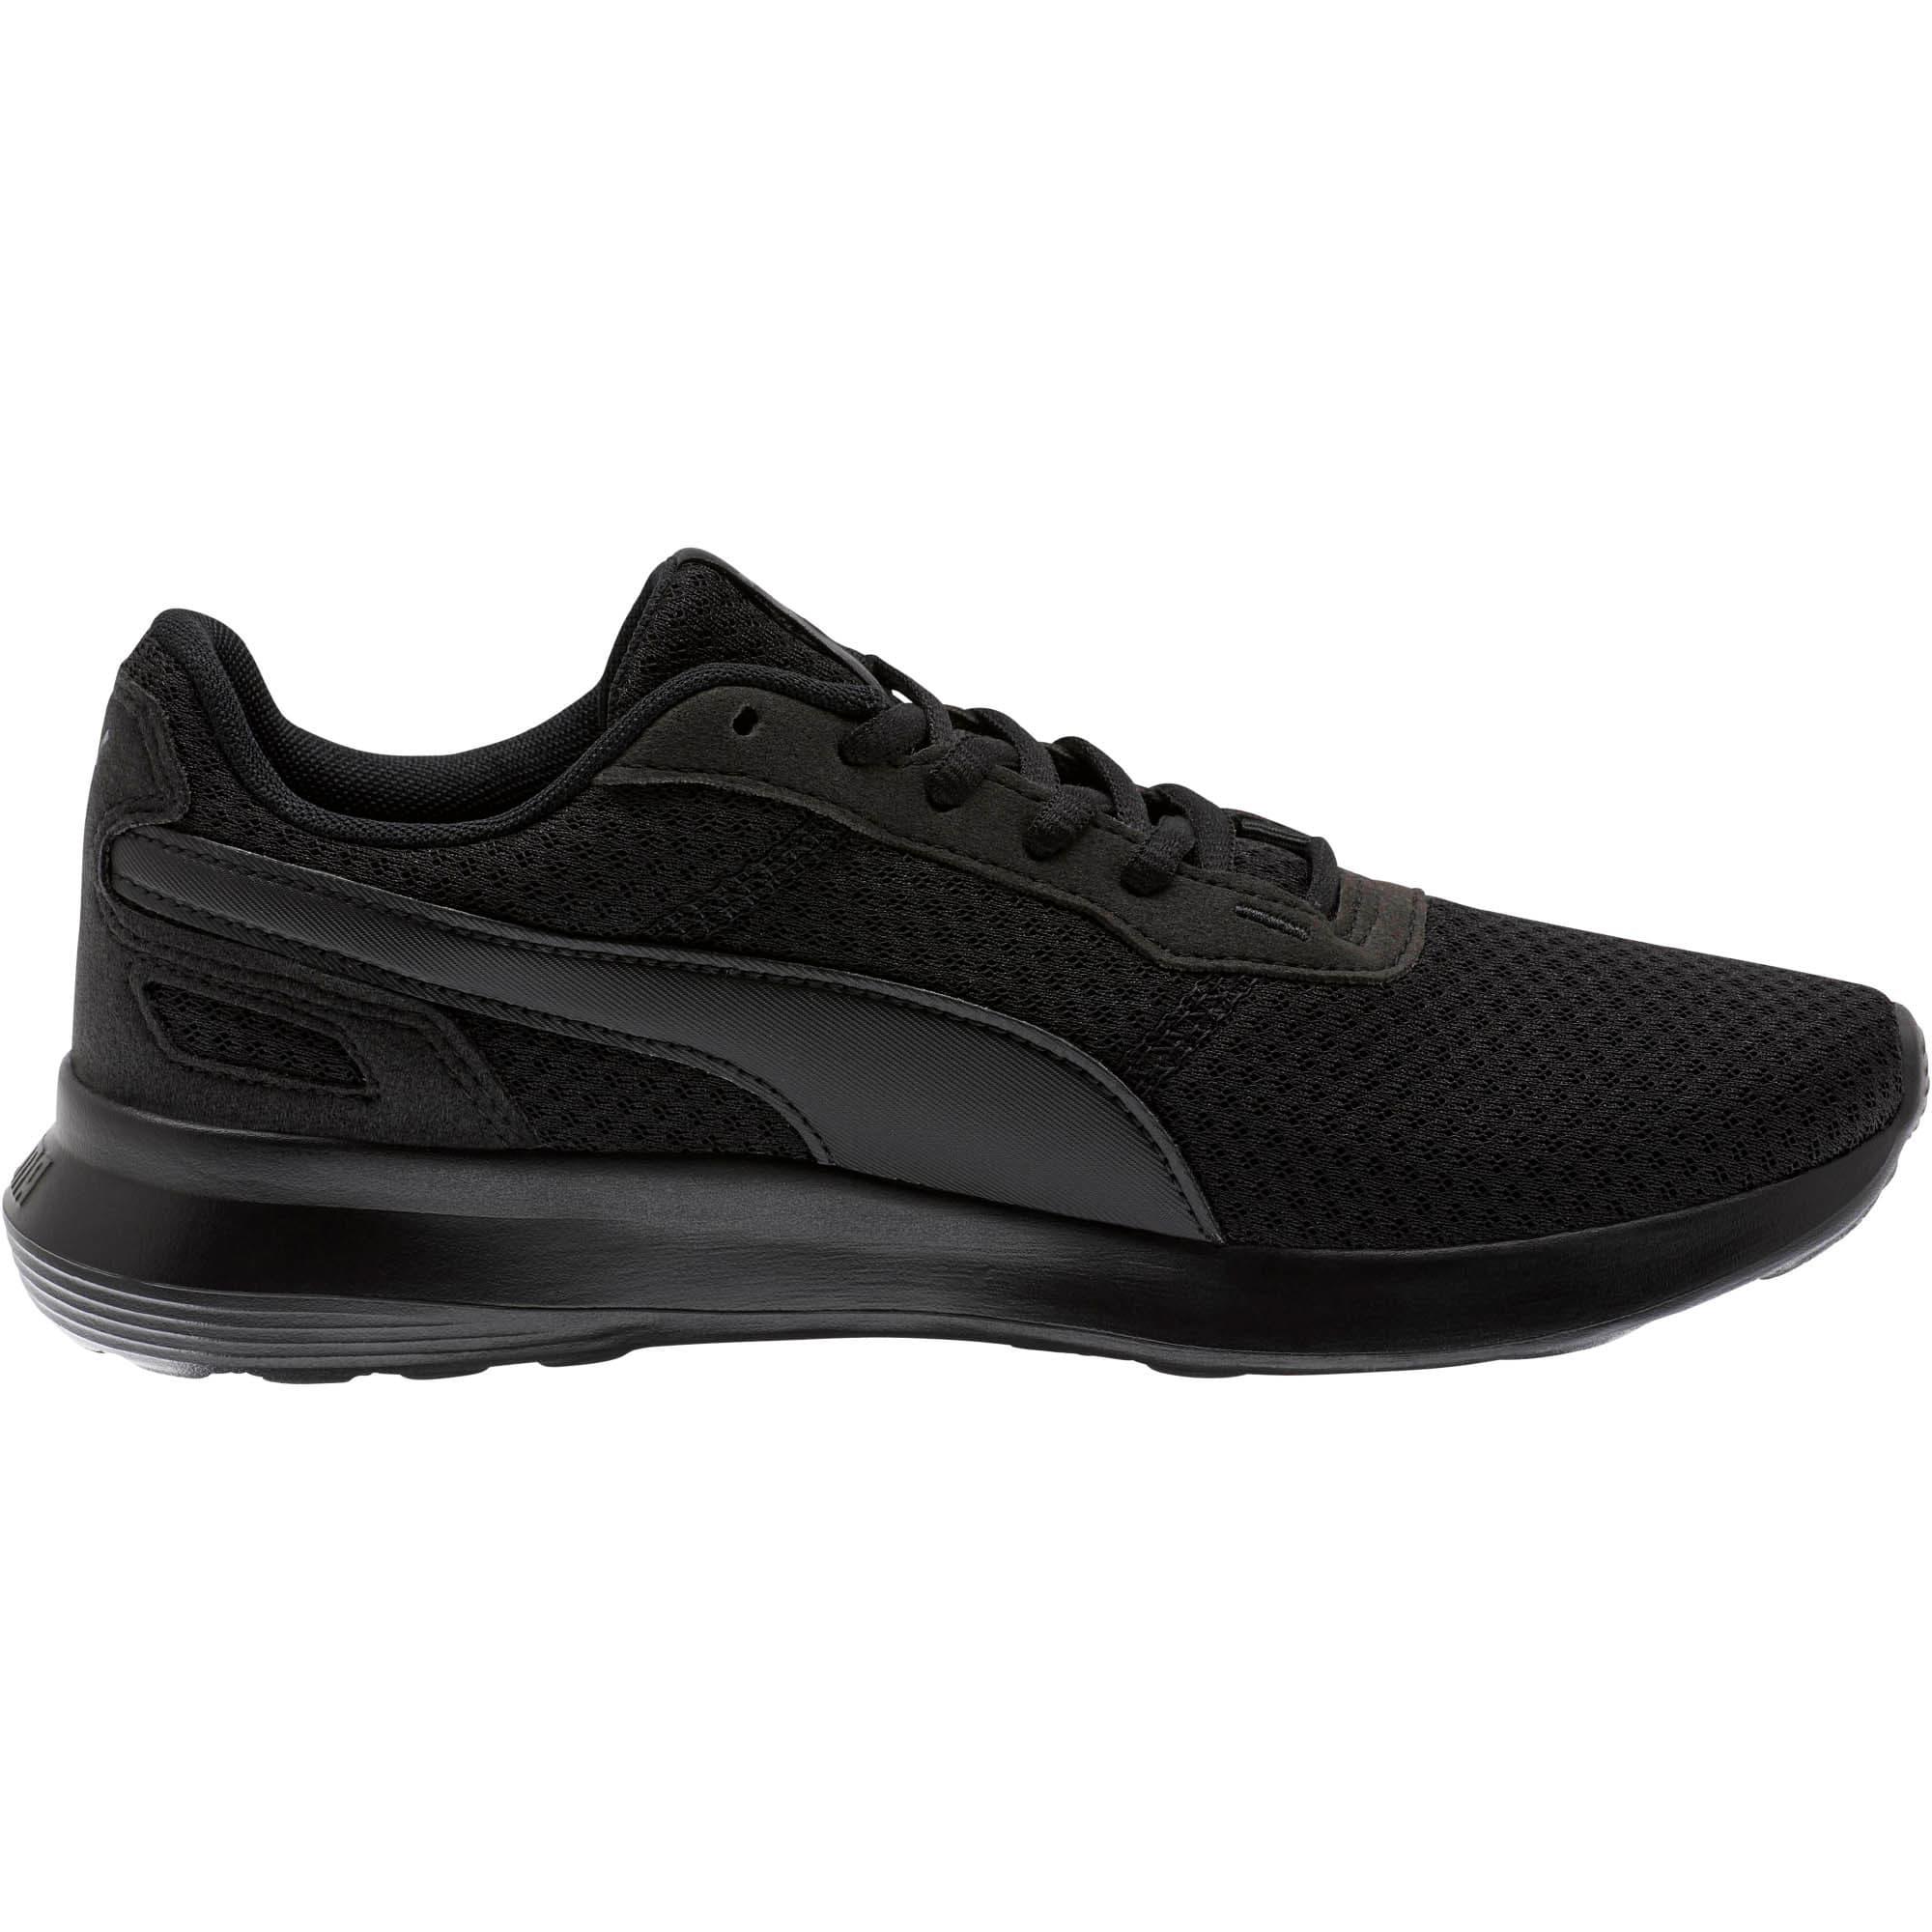 Thumbnail 4 of ST Activate Women's Sneakers, Puma Black-Puma Black, medium